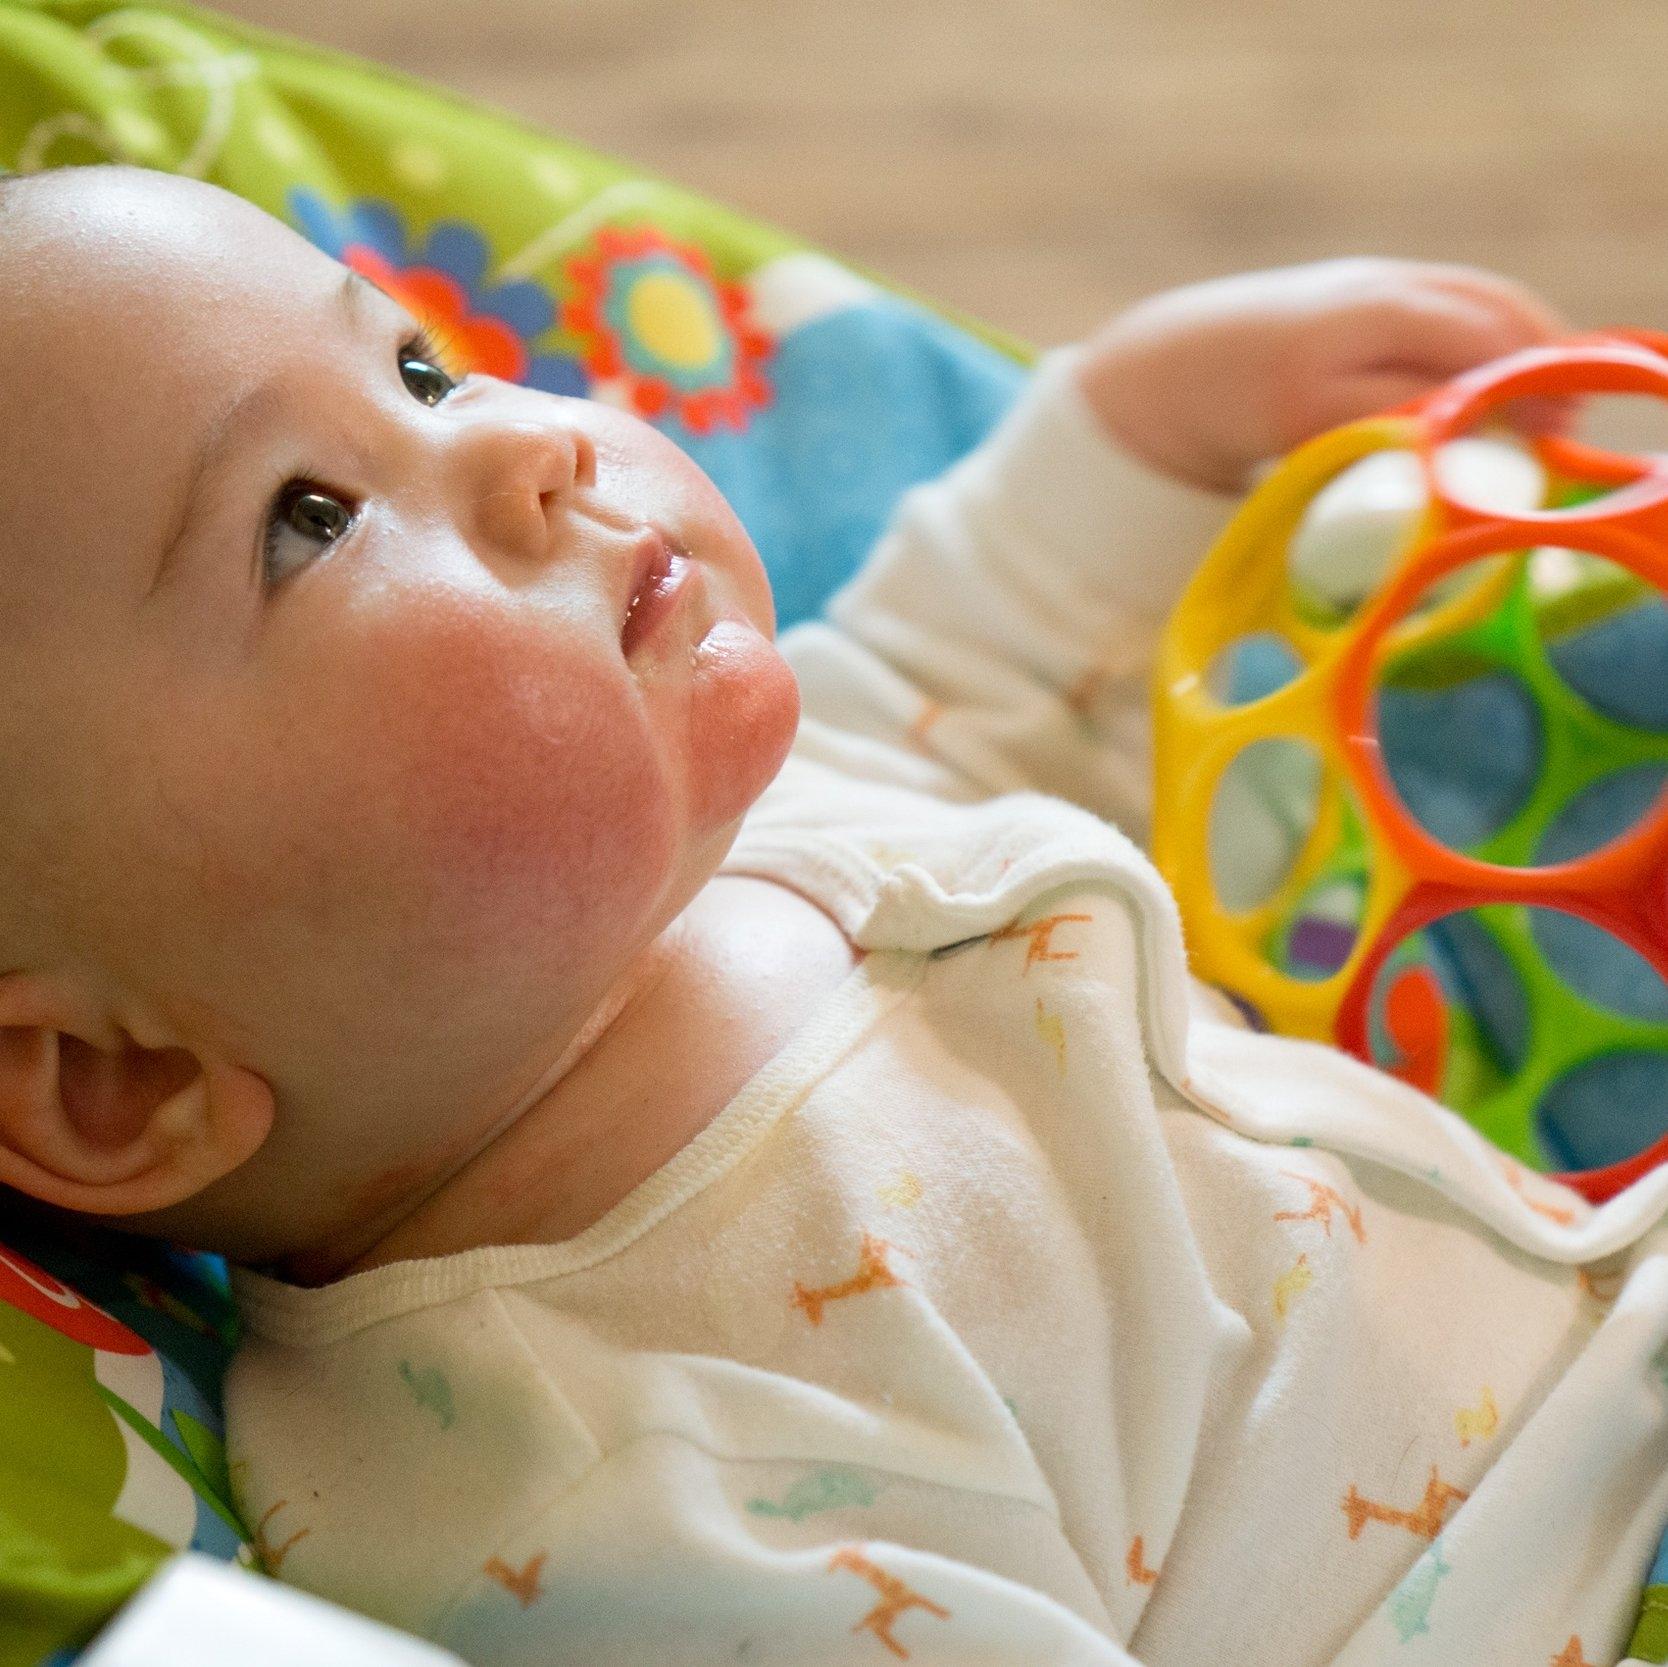 baby-933559.jpg